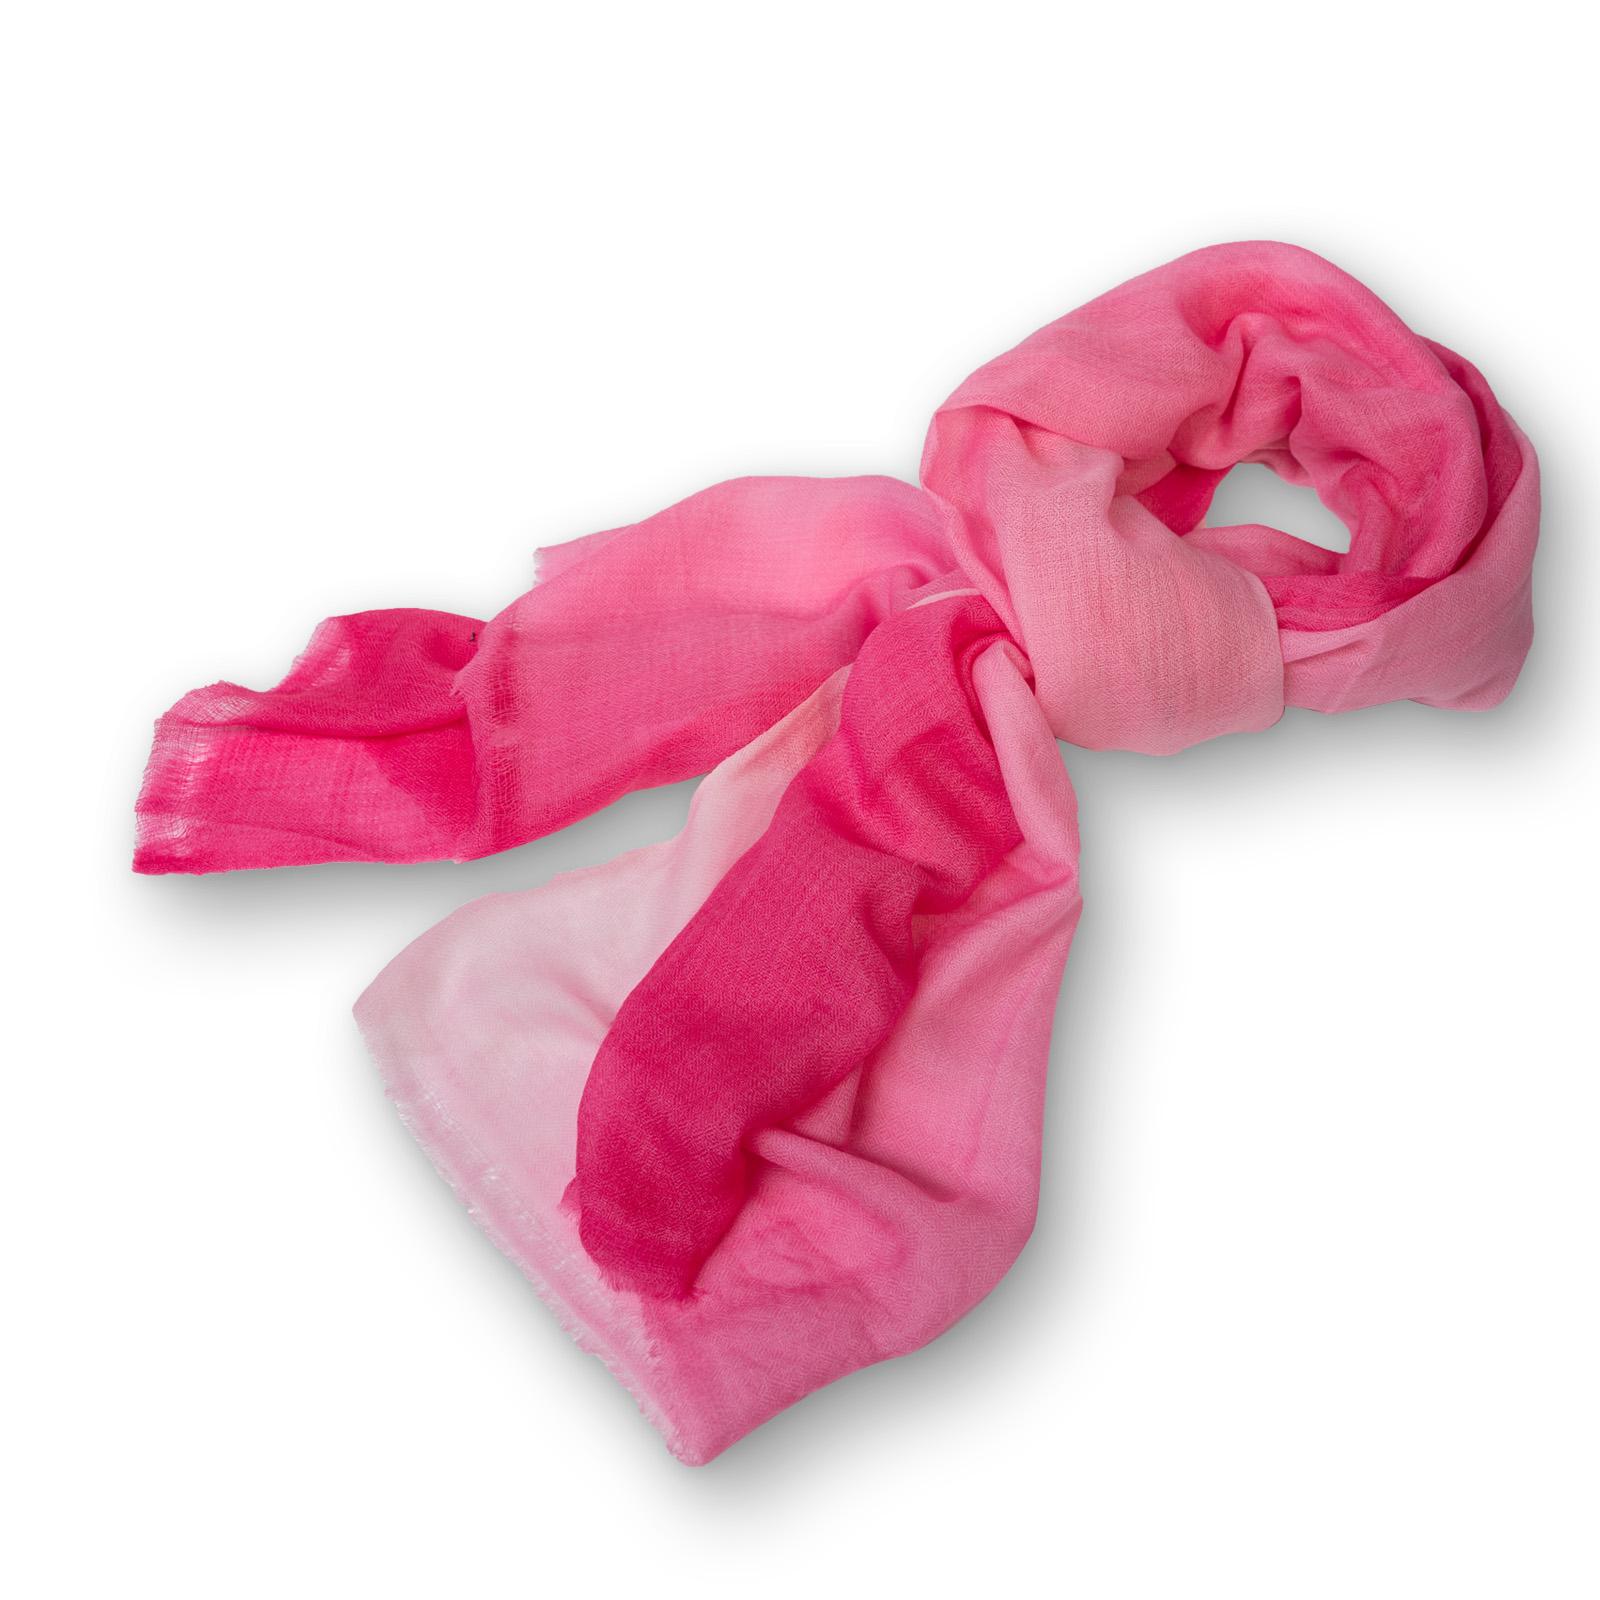 Pashmina - 100%  Cashmere  zweifarbig aus Nepal  70x200 cm  rosa-hellrosa